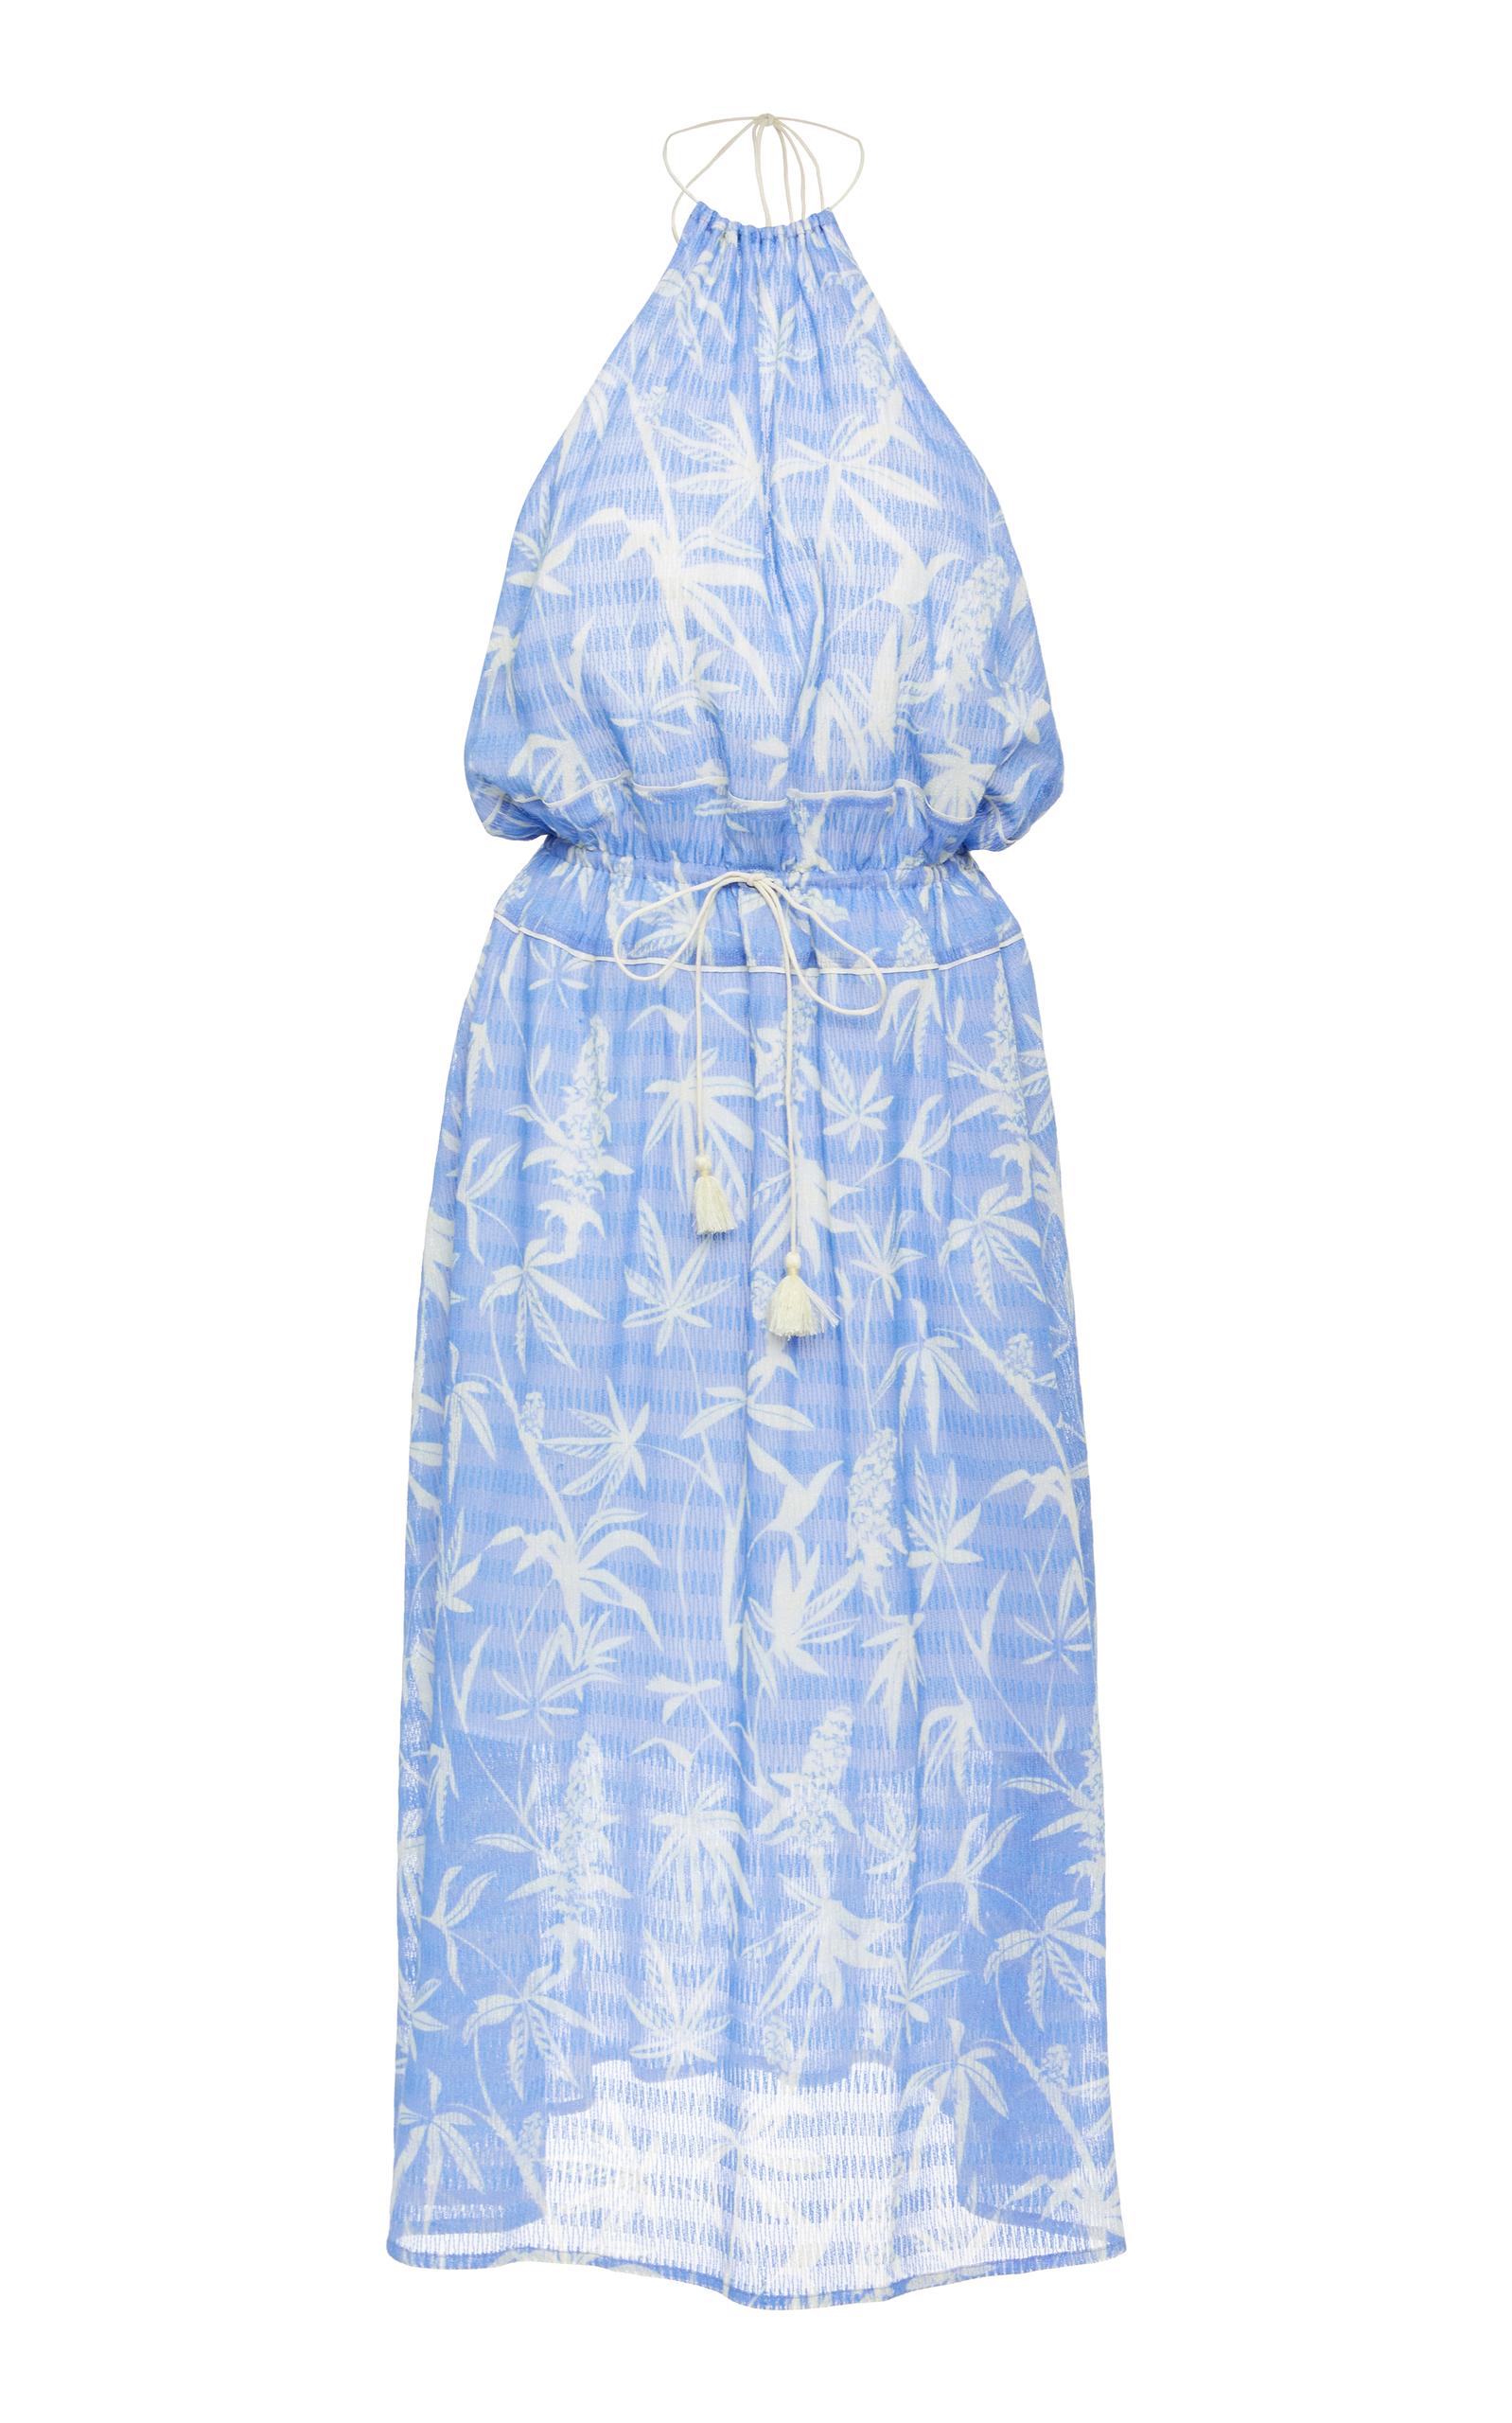 A PEACE TREATY Boetica Halter Dress, Blue